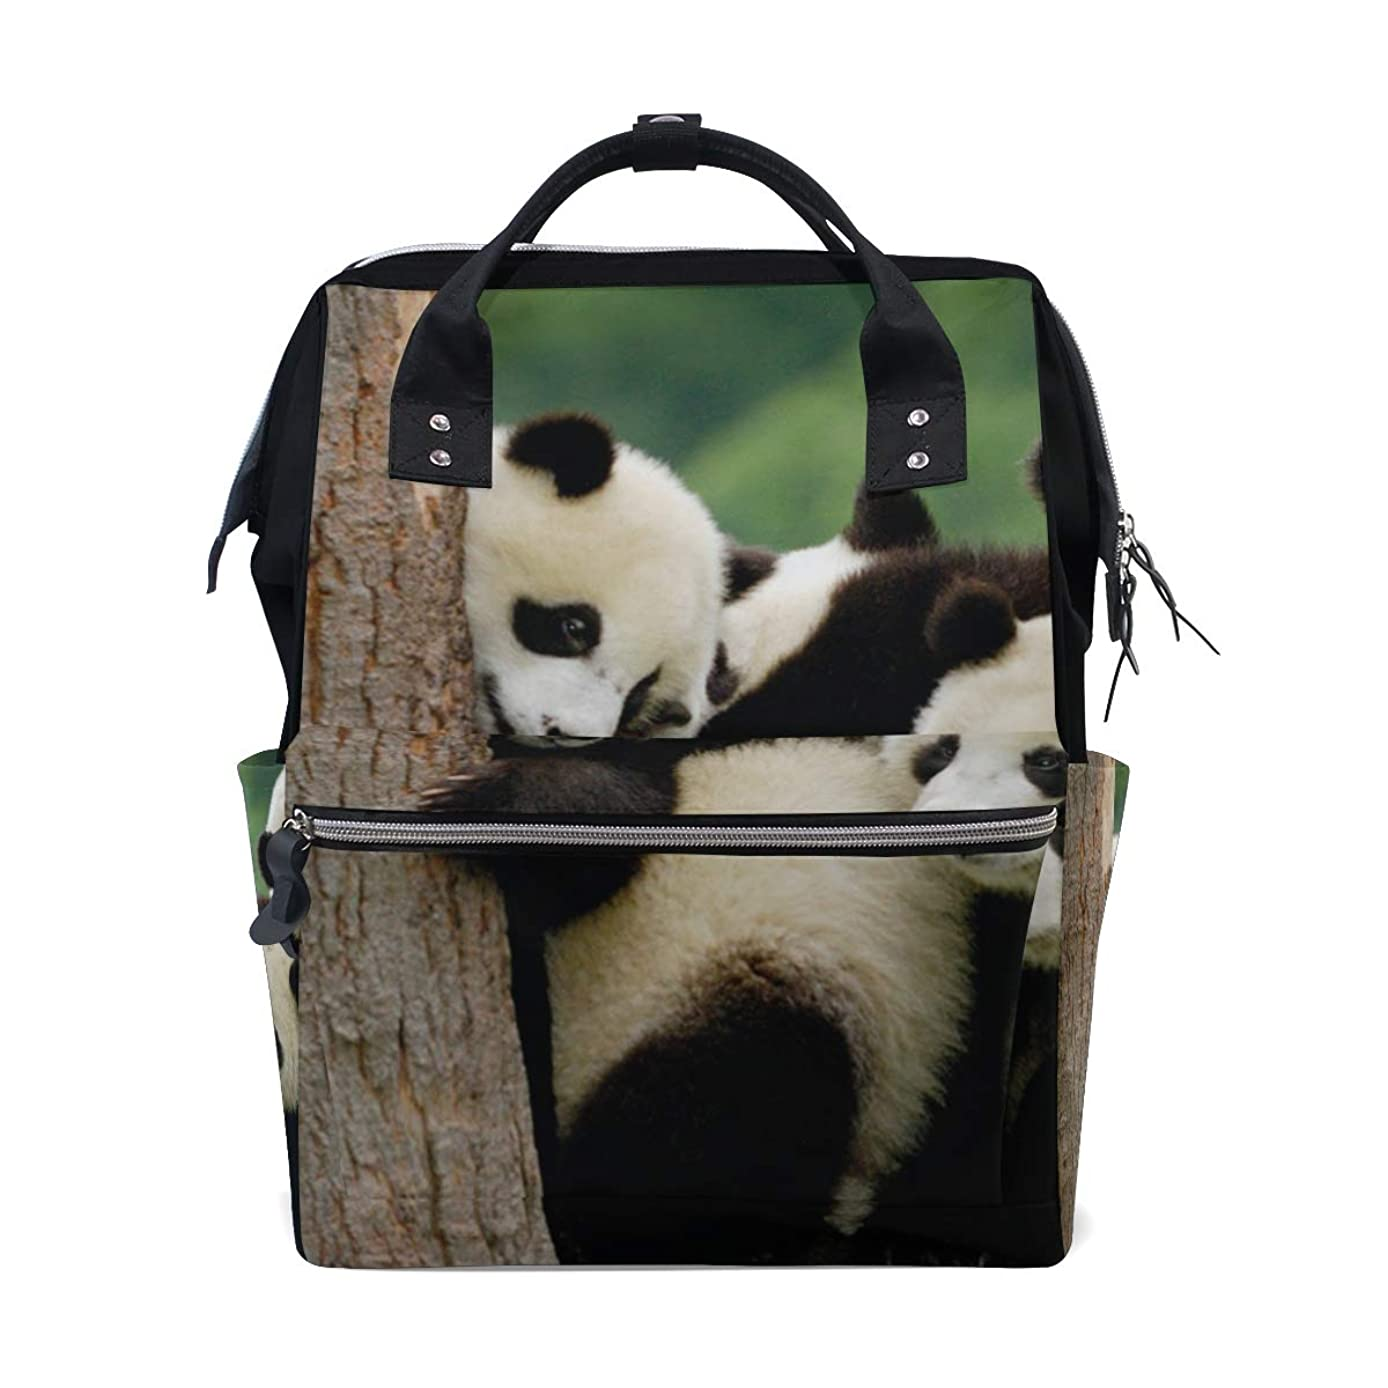 Cute Panda Family School Backpack Large Capacity Mummy Bags Laptop Handbag Casual Travel Rucksack Satchel For Women Men Adult Teen Children